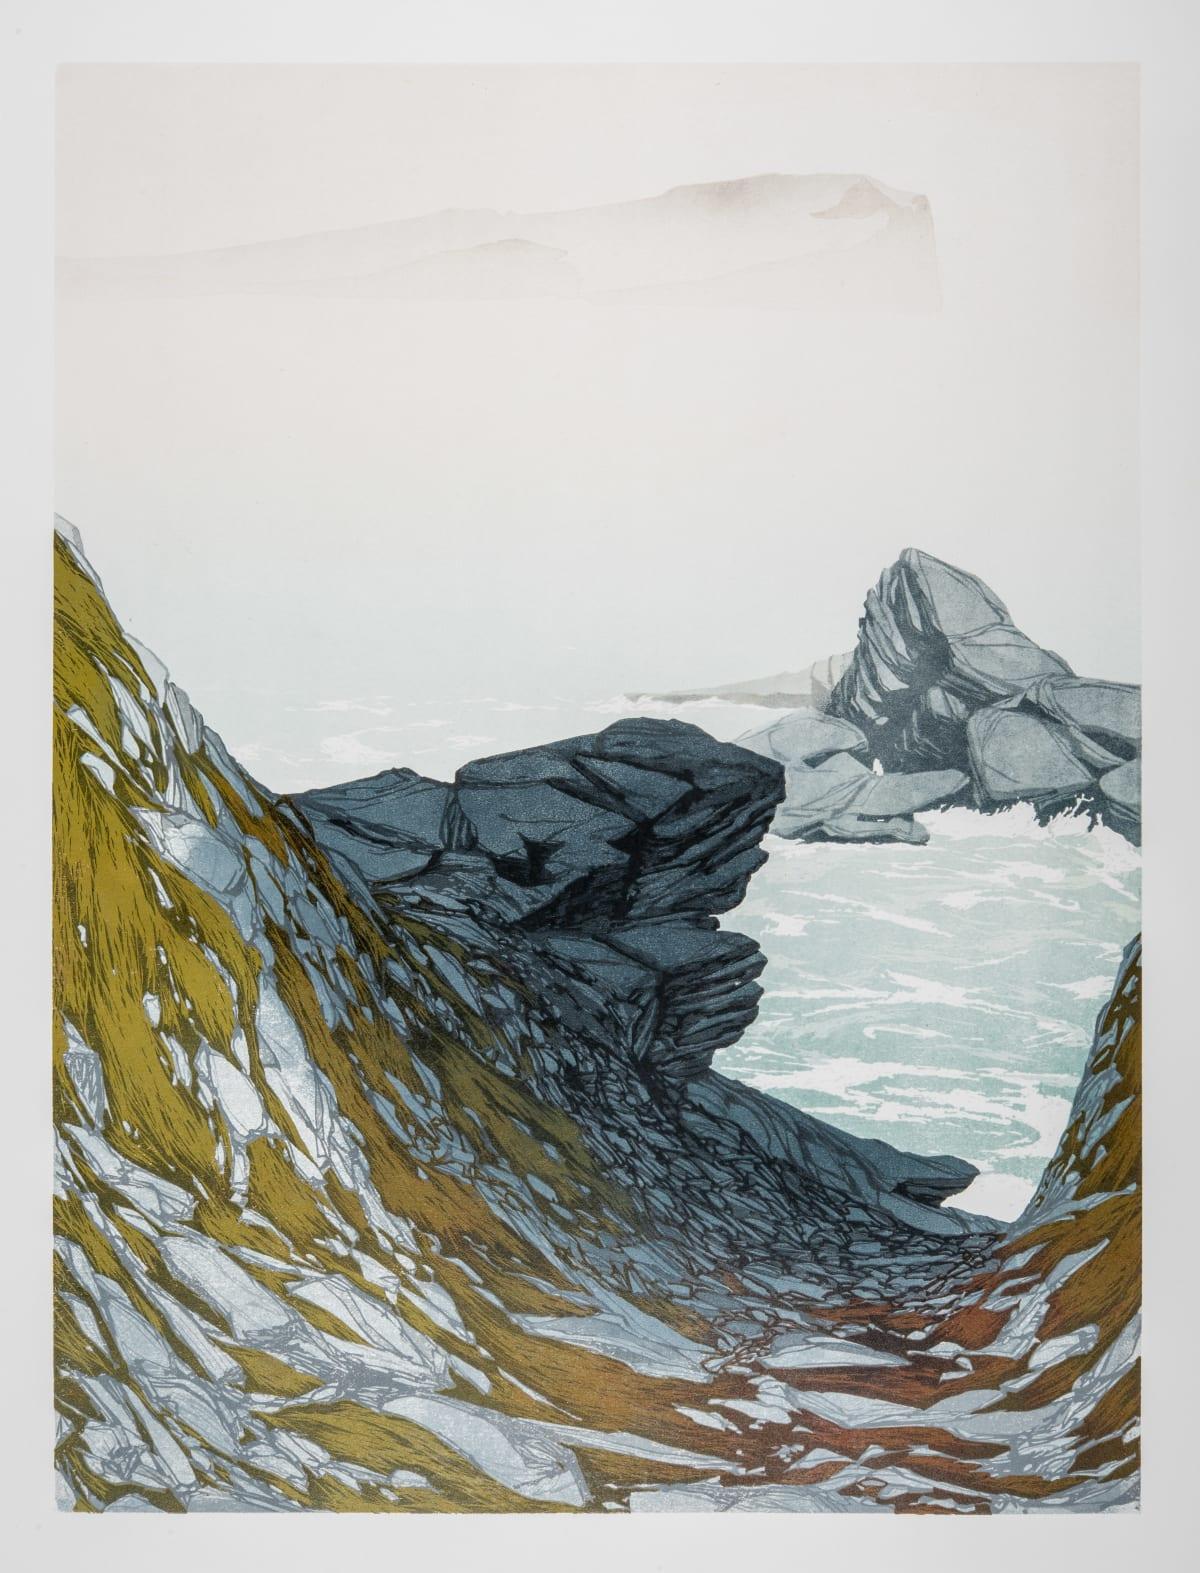 Laura Boswell Skye Sea Mist, 2019 Linocut 44 x 59 x 3 cm 17 3/8 x 23 1/4 x 1 1/8 in Edition 1 of 16